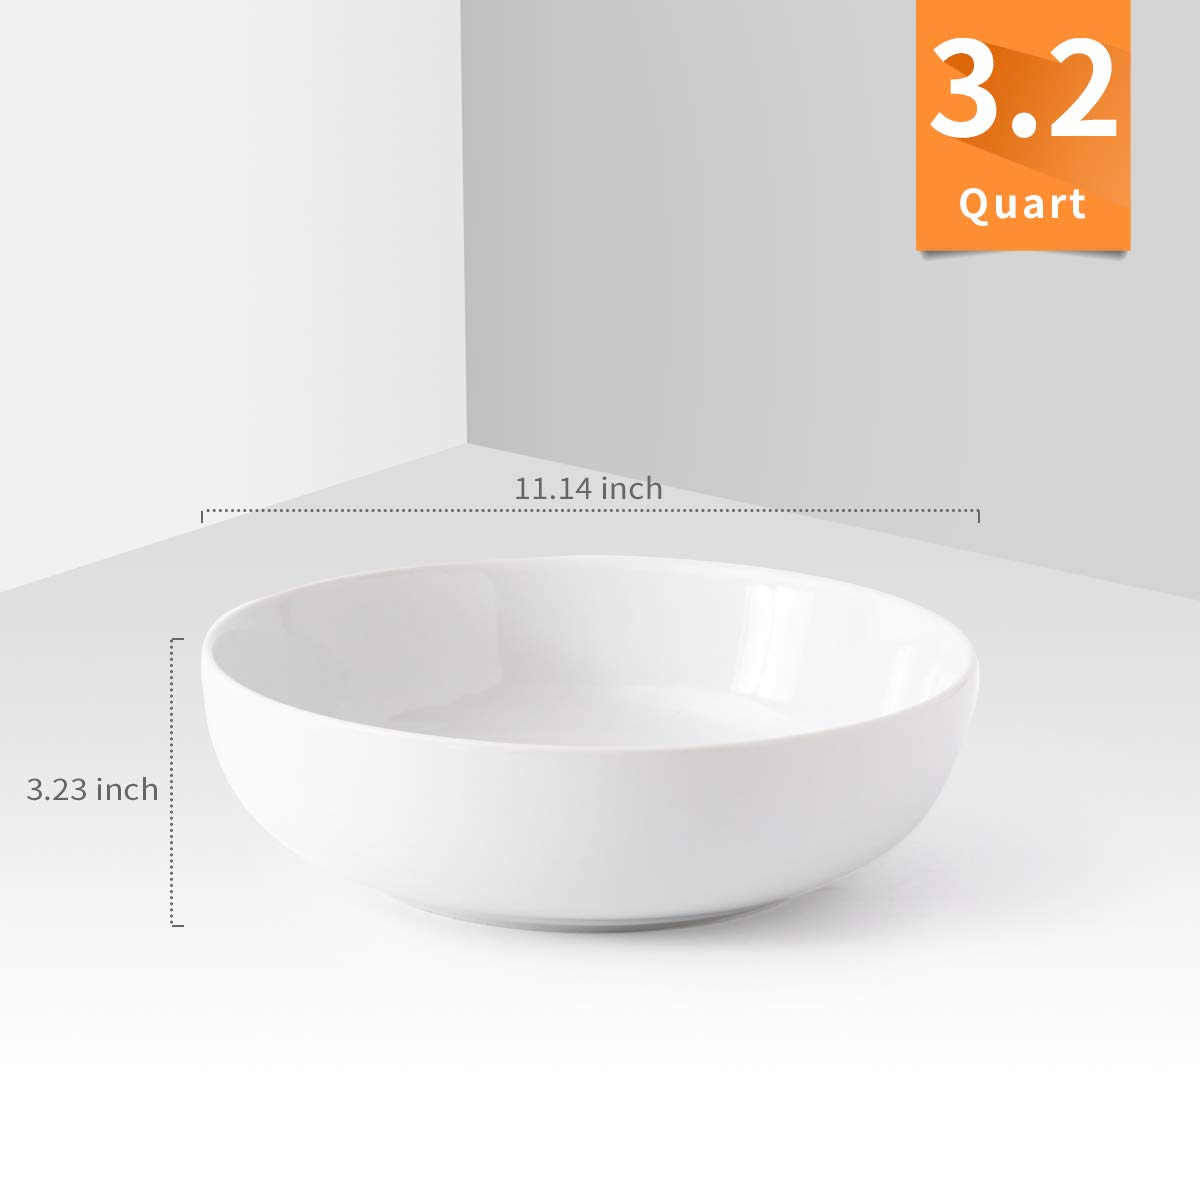 Large Ceramic Bowl Set White 3.2 Quart Porcelain Serving Bowl Set Salad Bowl Set 2 Pack